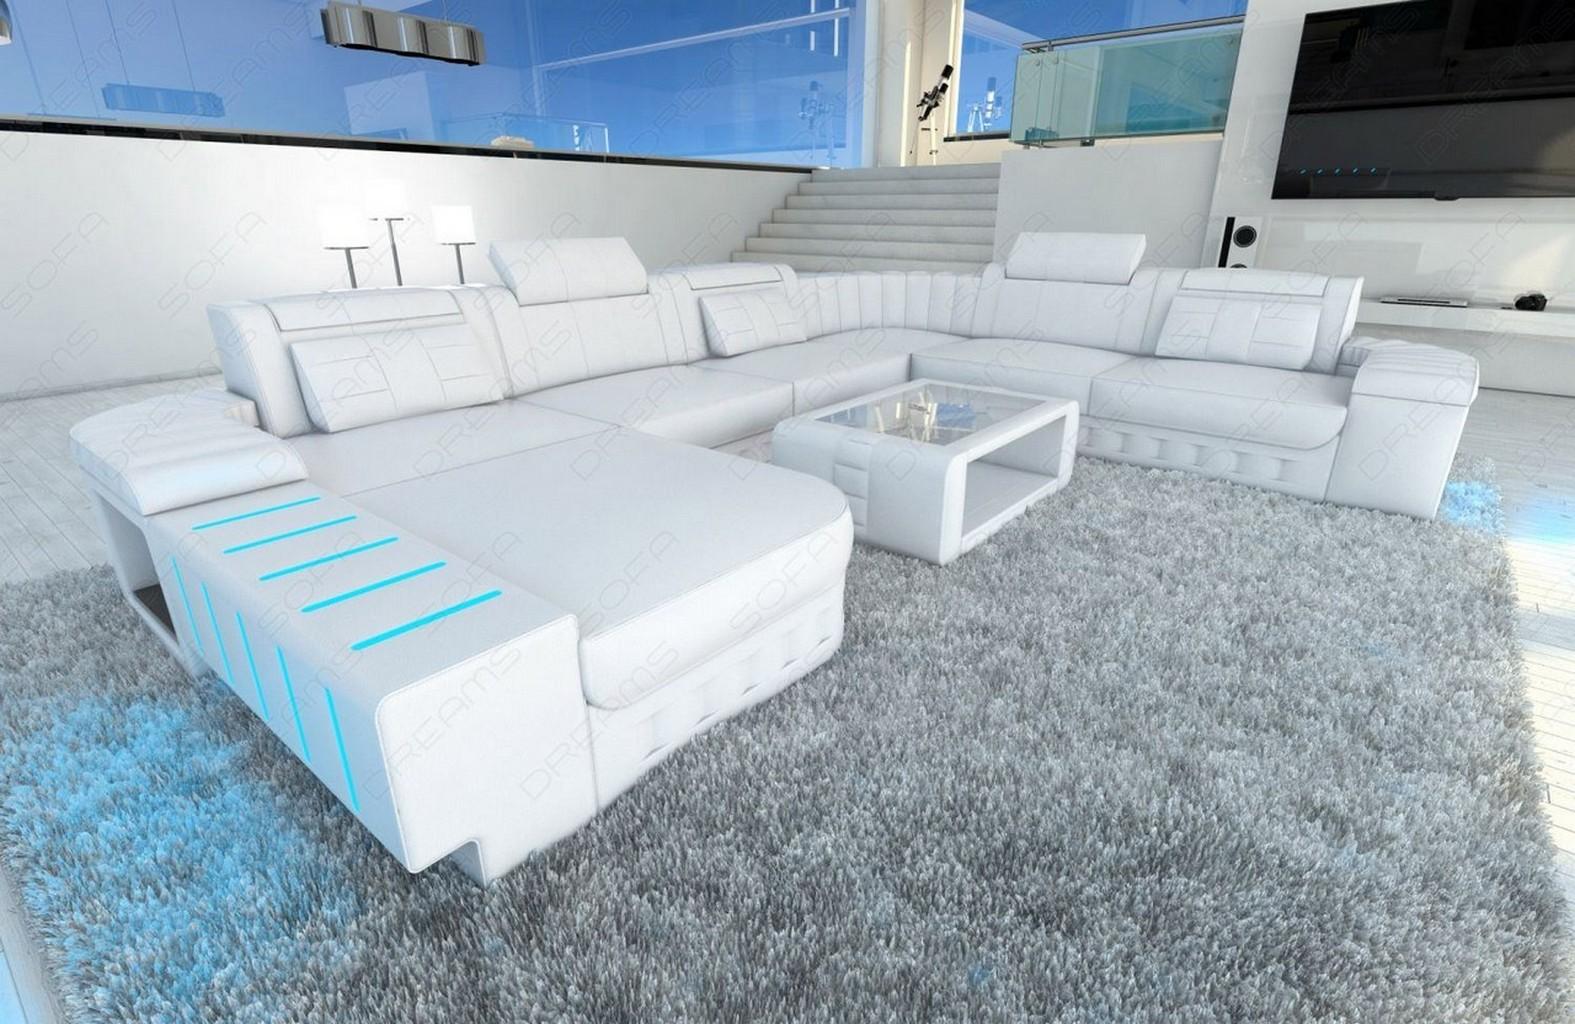 xxl sectional sofa bellagio led u shaped white white ebay. Black Bedroom Furniture Sets. Home Design Ideas